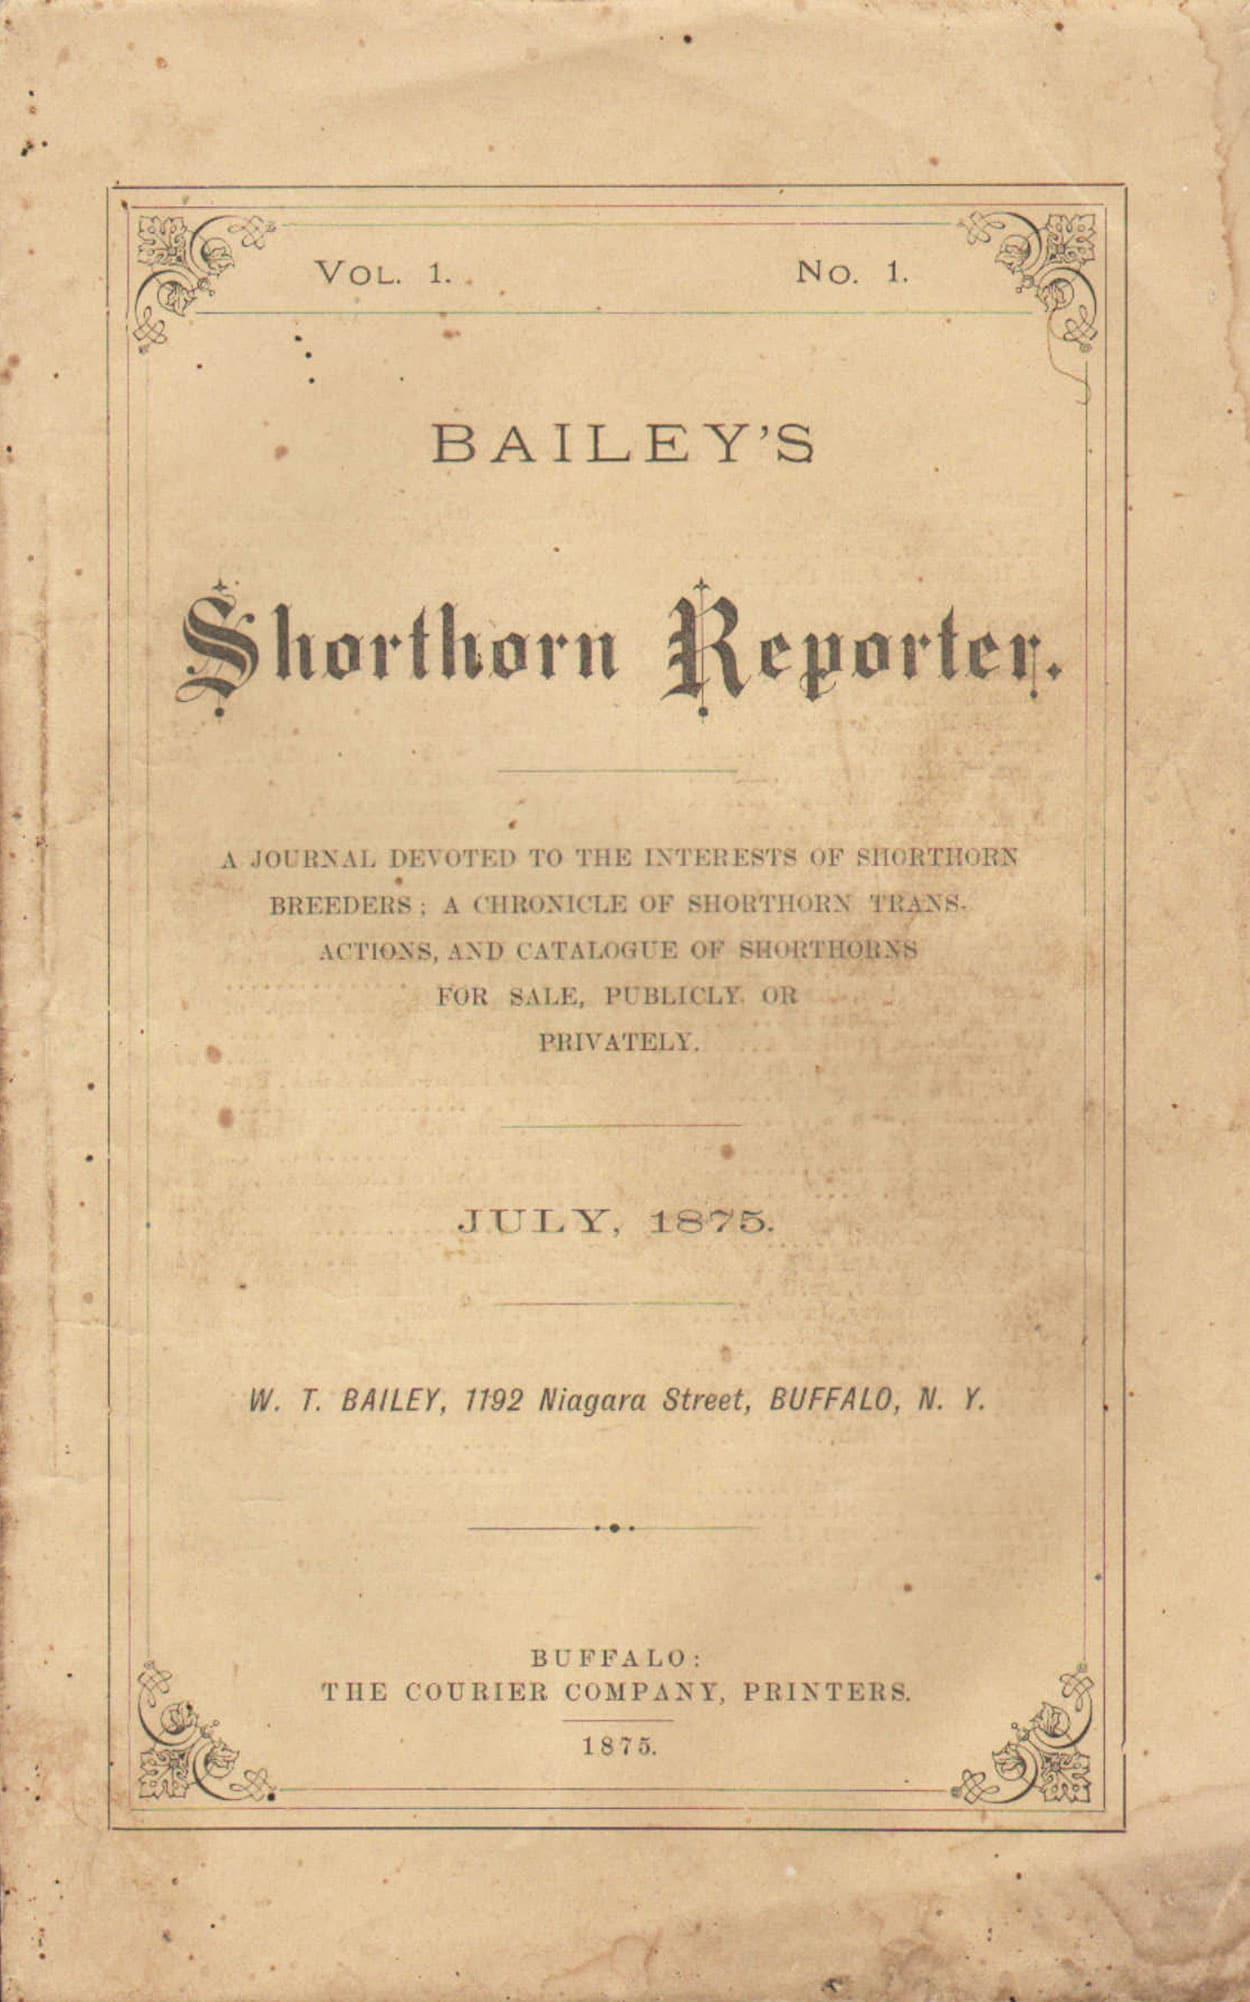 Bailey's Shorthorn Reporter